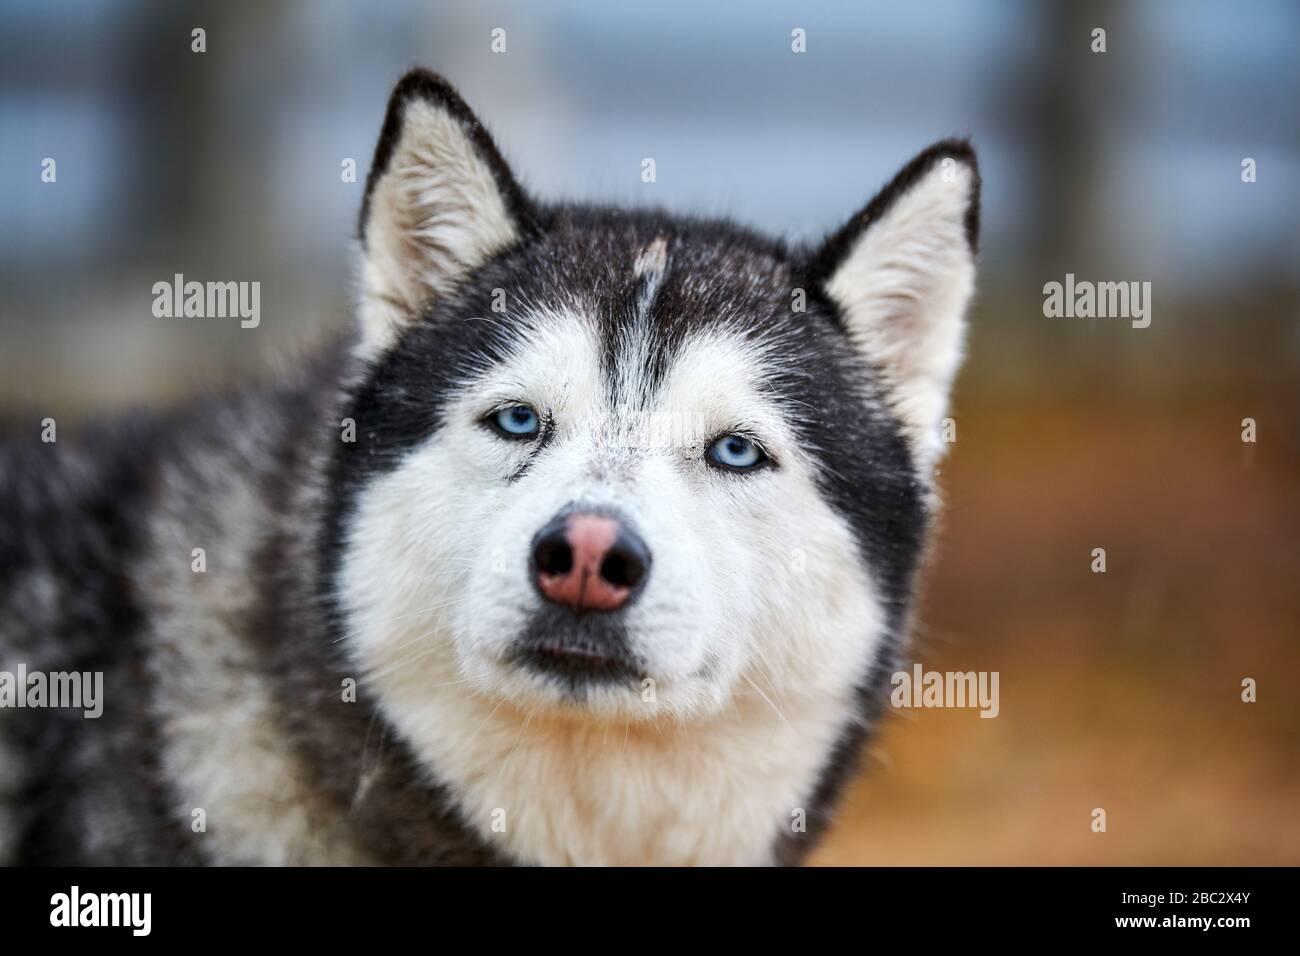 Husky dog outdoor portrait. Funny pet on walking before sled dog racing. Stock Photo